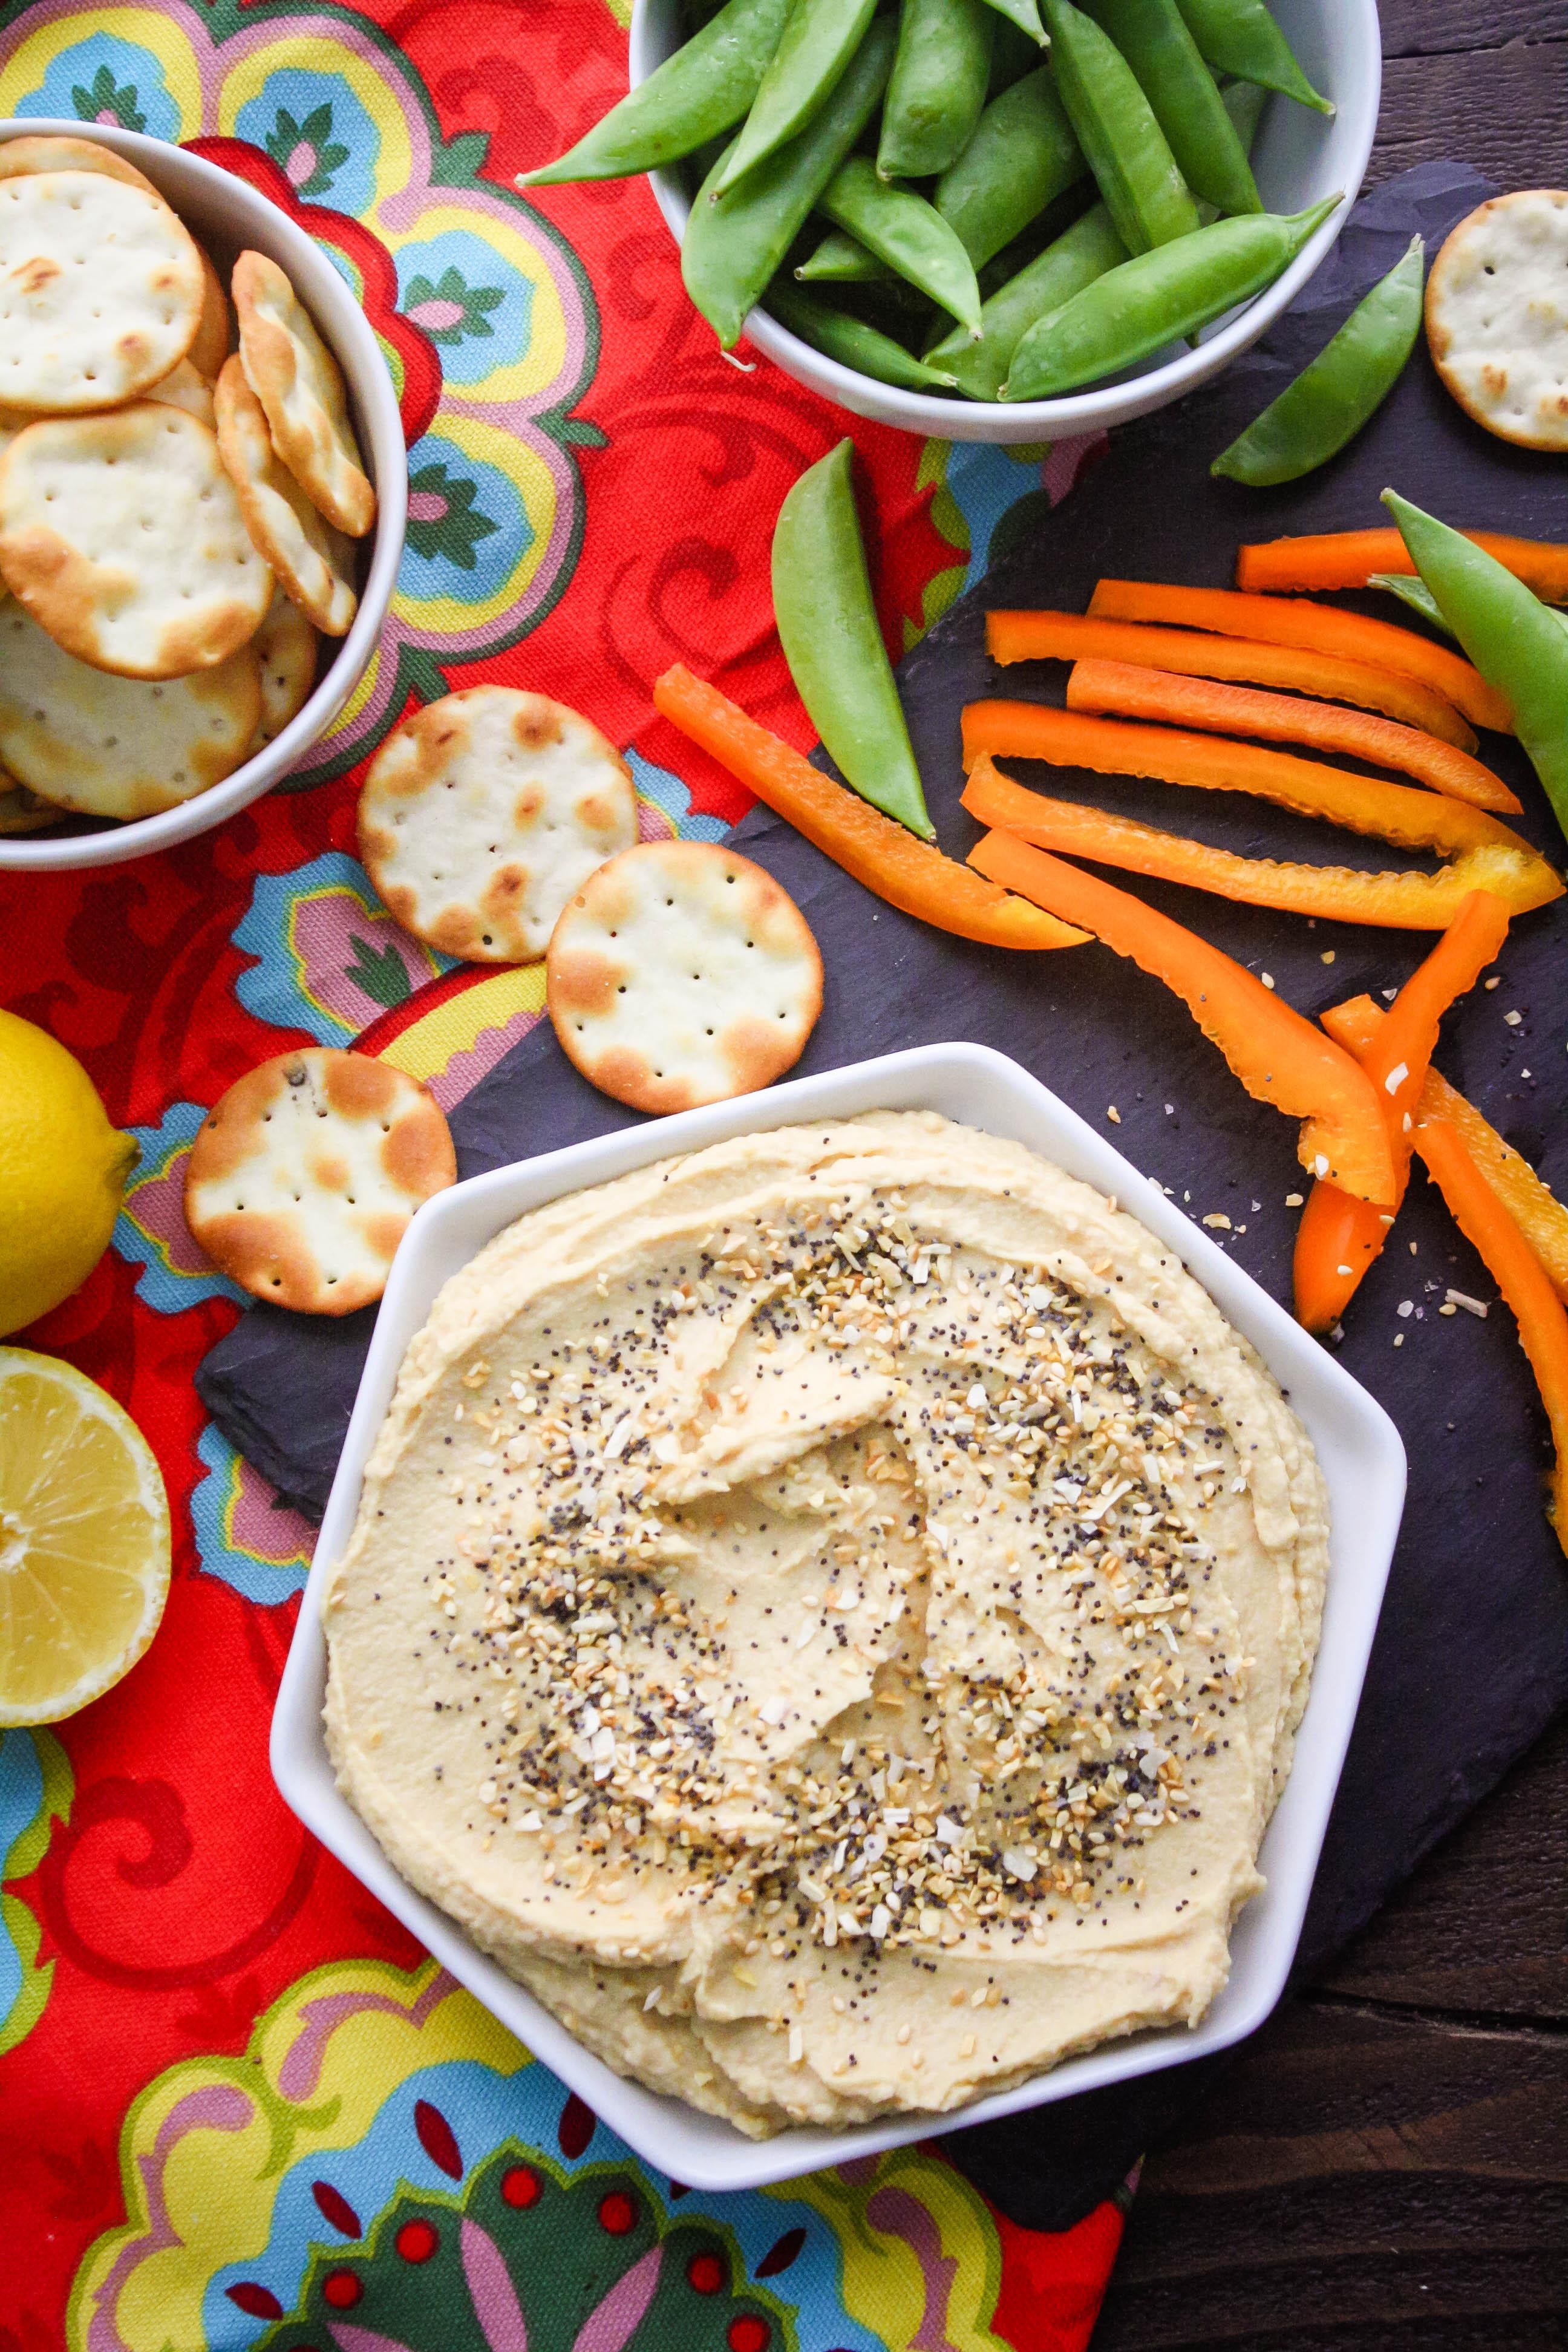 Easy Everything Hummus with Homemade Seasoning is a fabulous snack. Easy Everything Hummus with Homemade Seasoning is an easy snack to whip up.